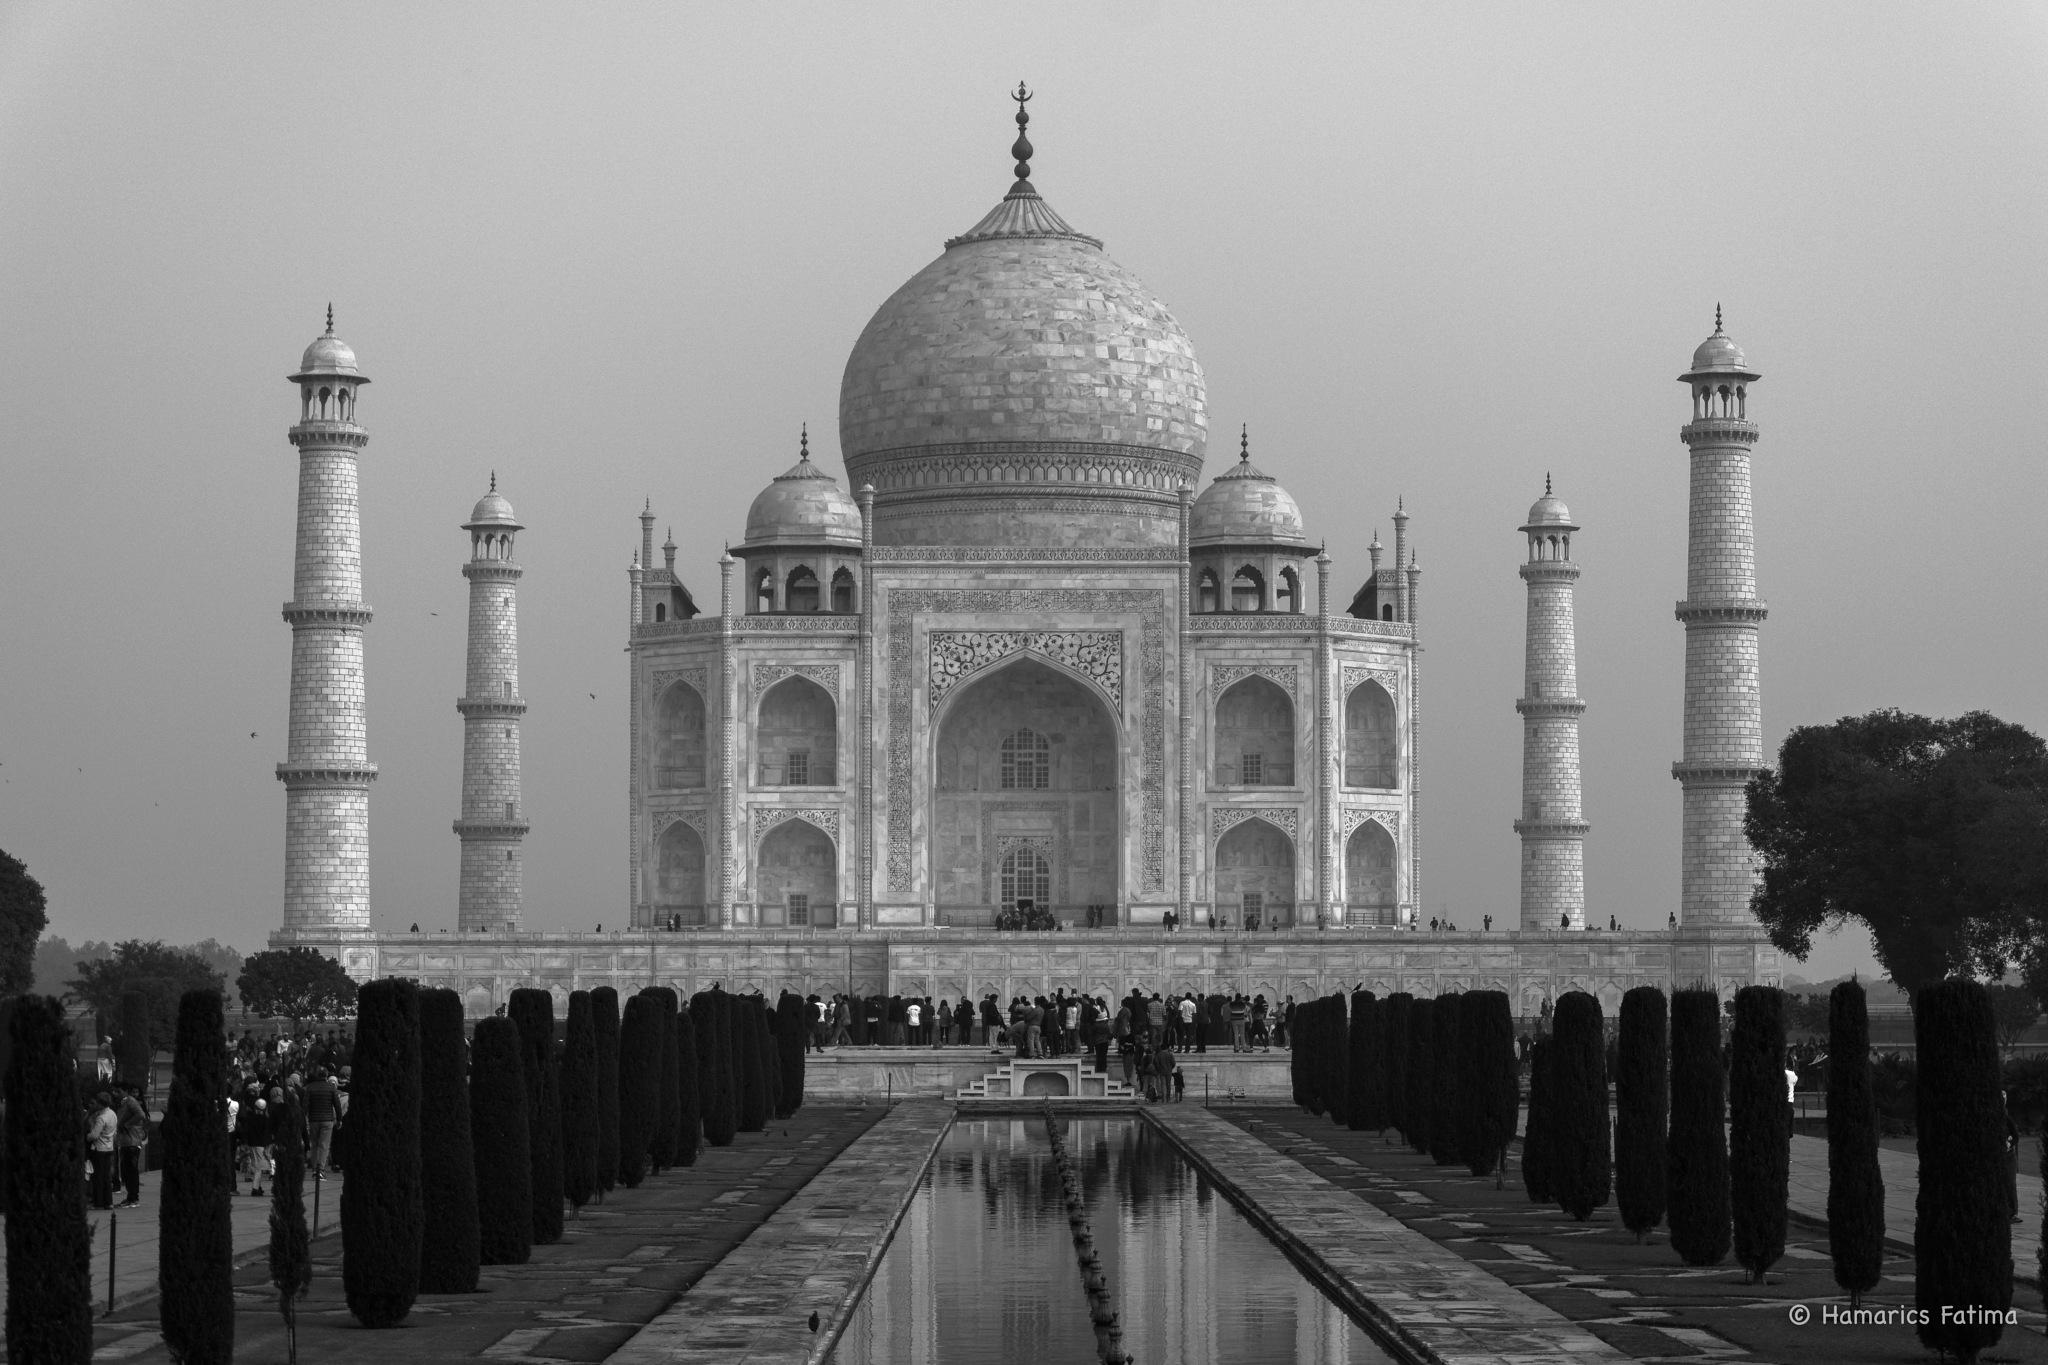 Taj Mahal, Agra by Fatima Hamarics